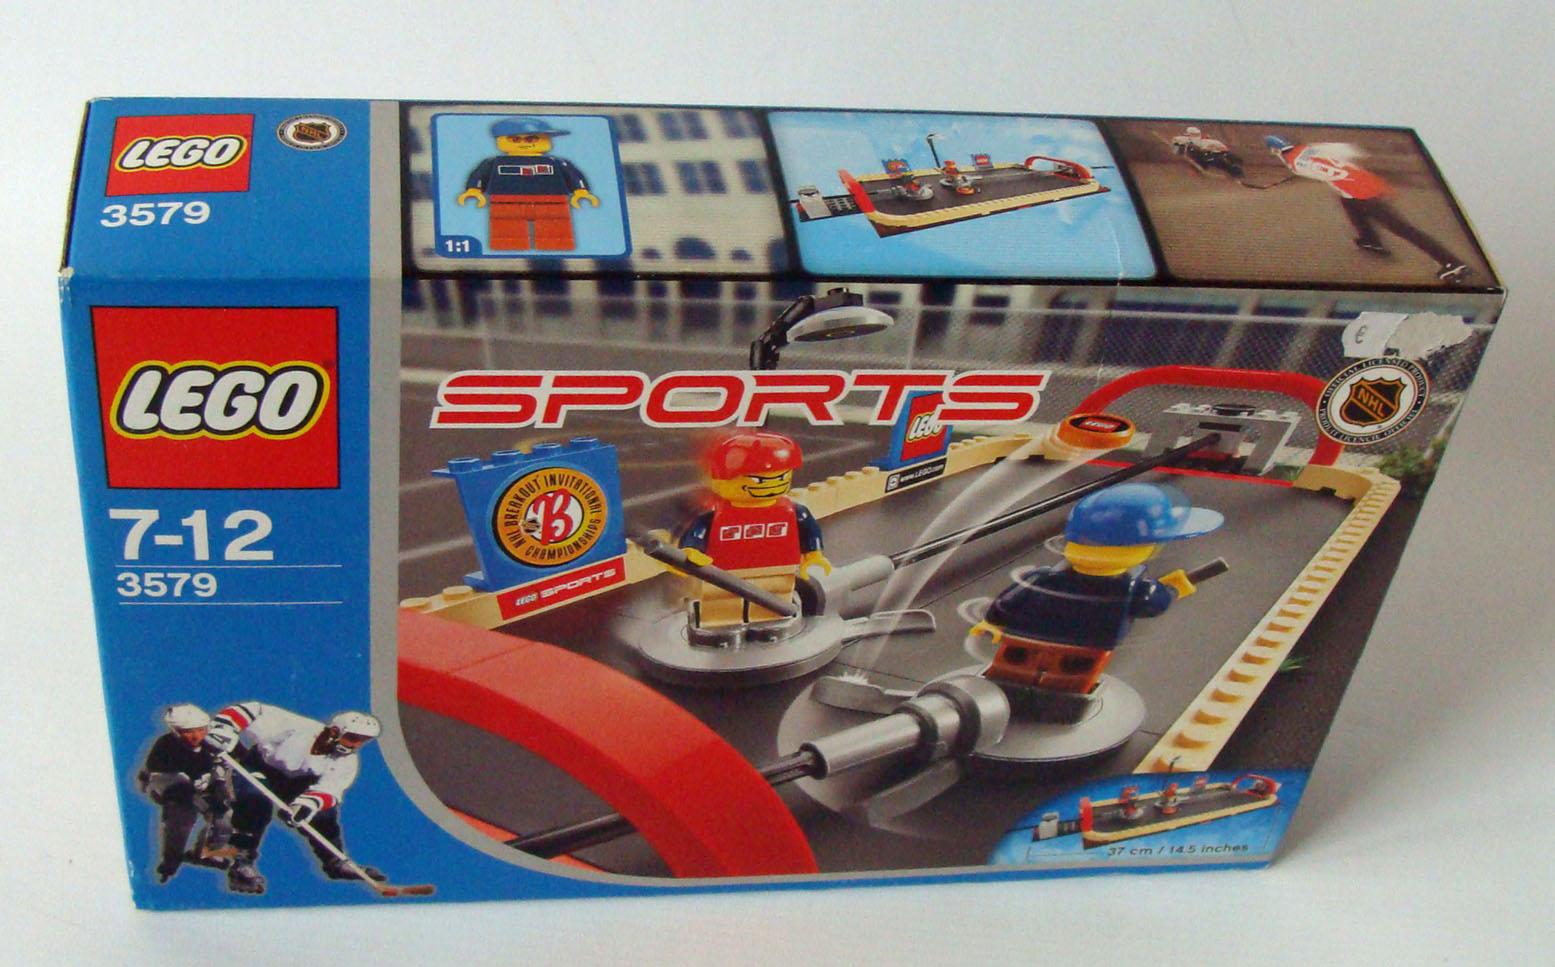 lego sports 3579 nhl street hockey 114 teile 7 12. Black Bedroom Furniture Sets. Home Design Ideas